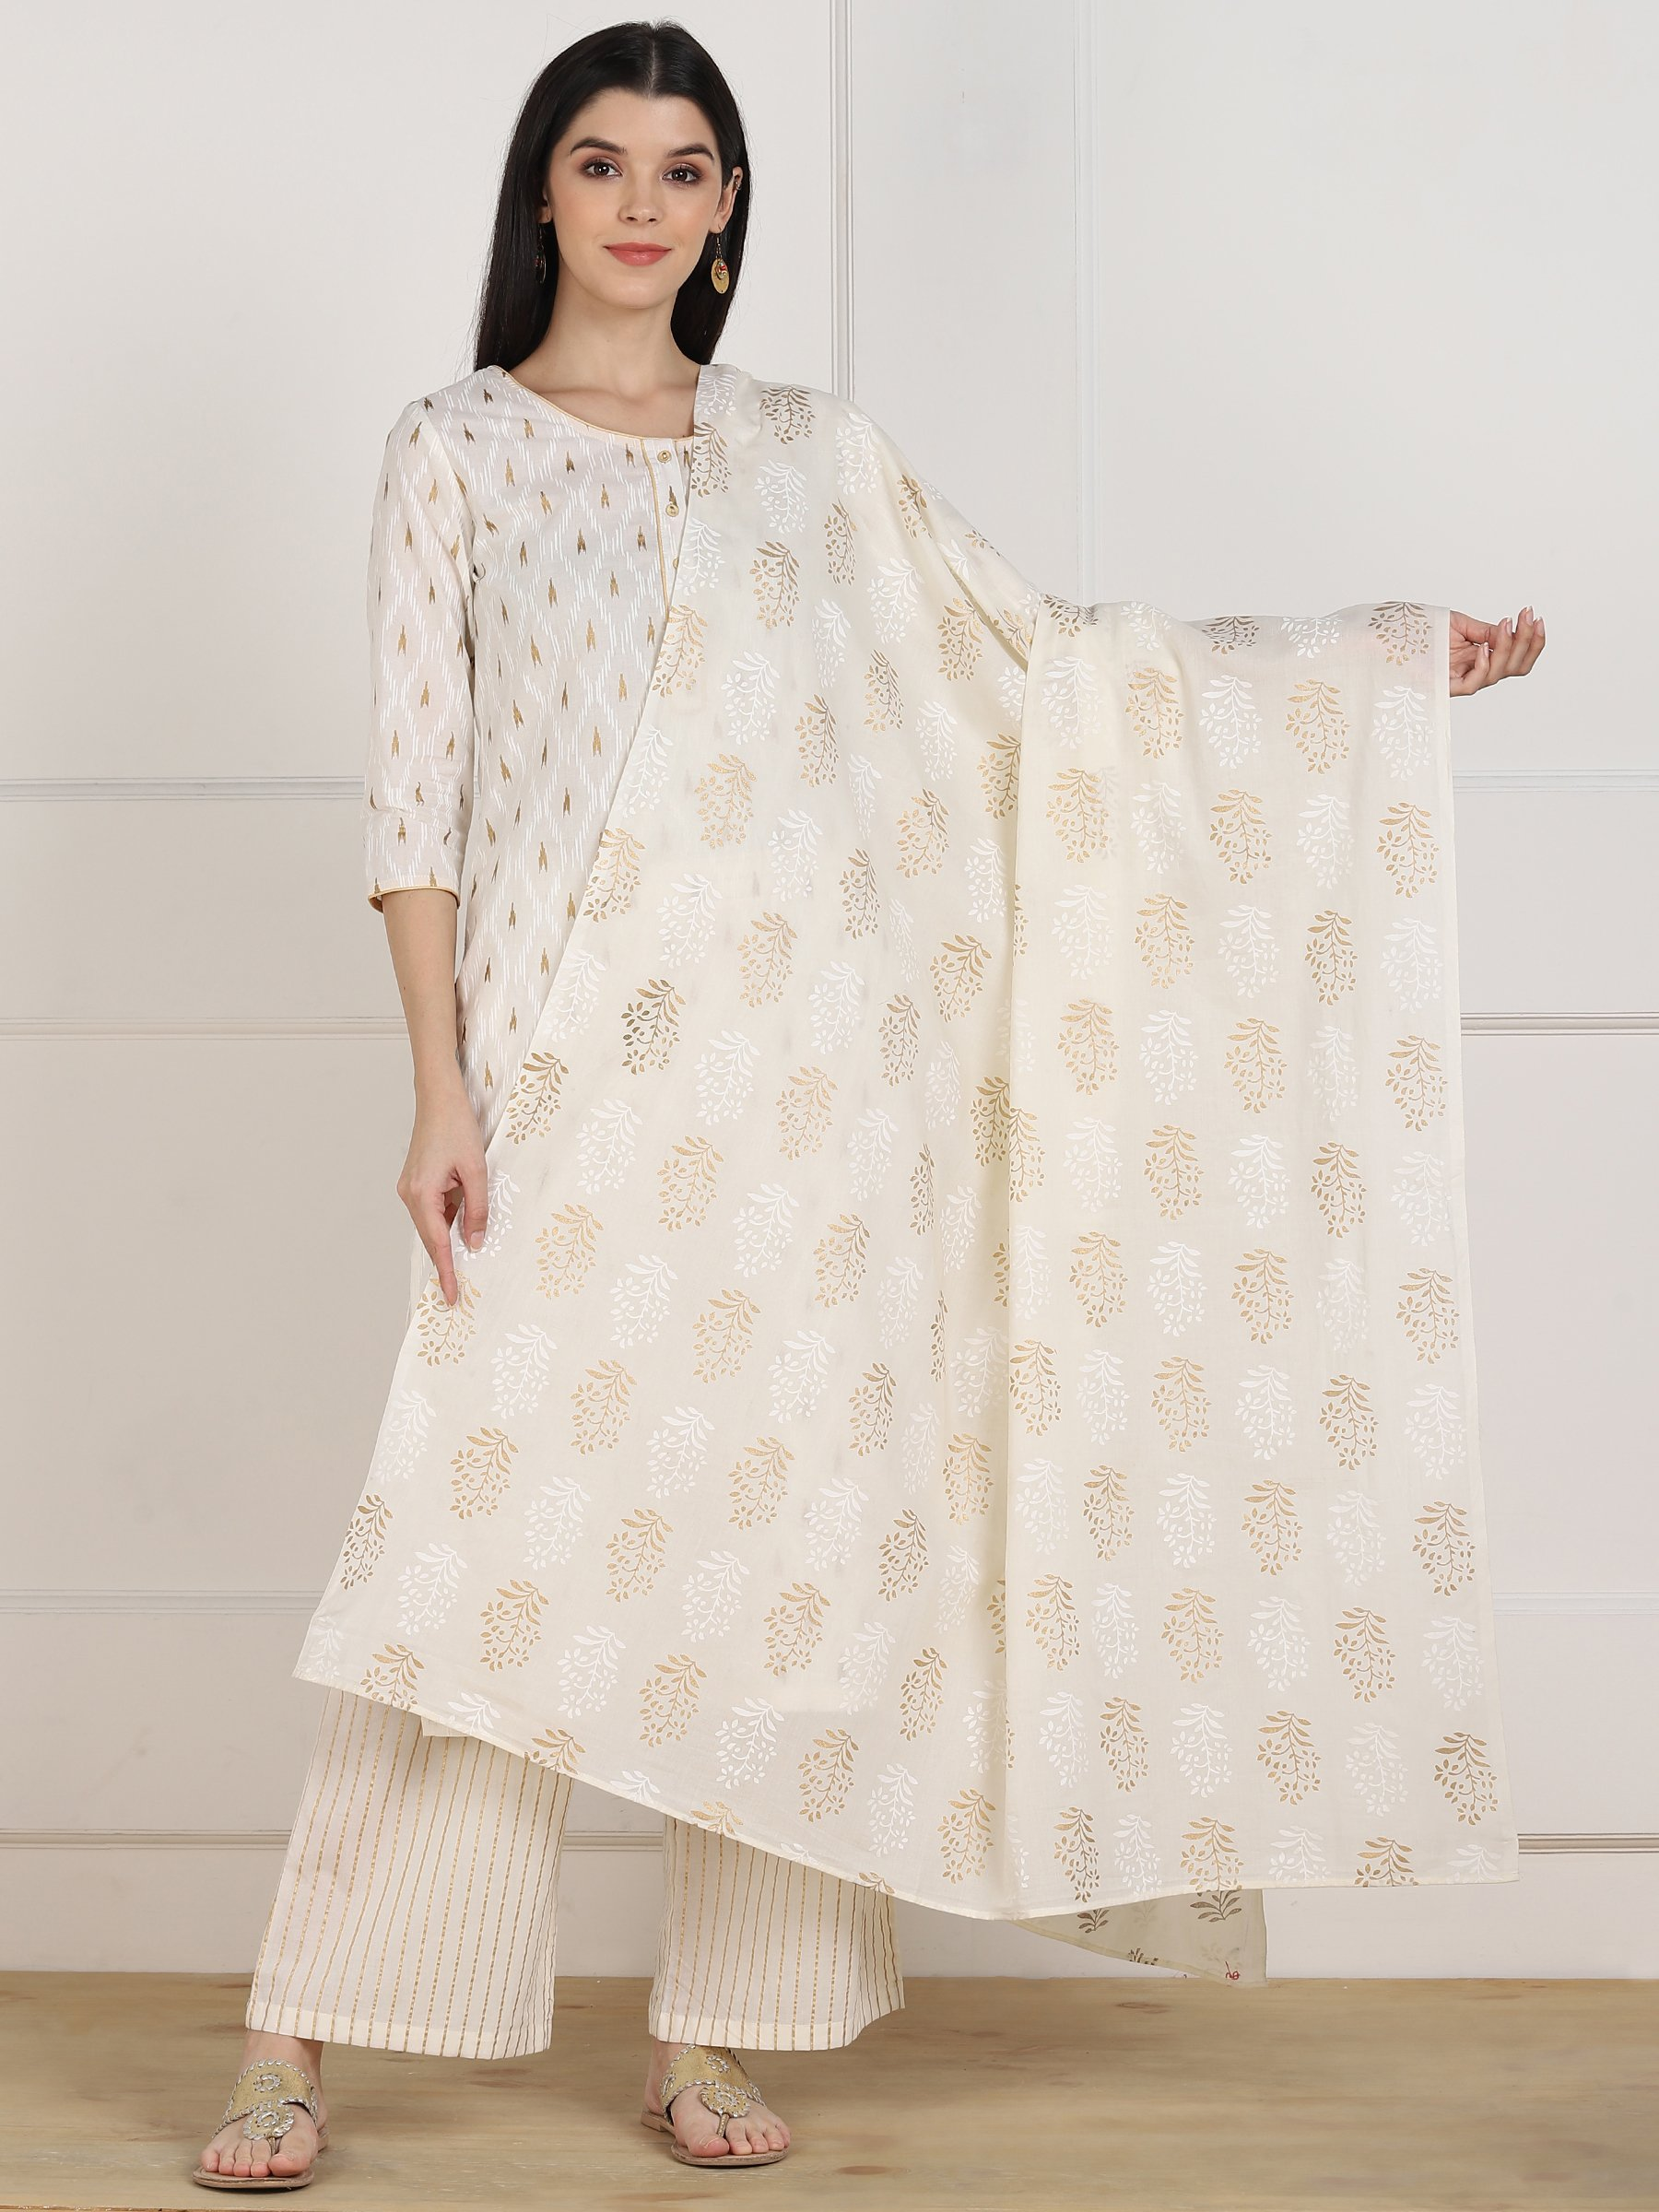 ZNX CLOTHING |  Women White Printed Straight Kurta Palazzo & Dupatta Set